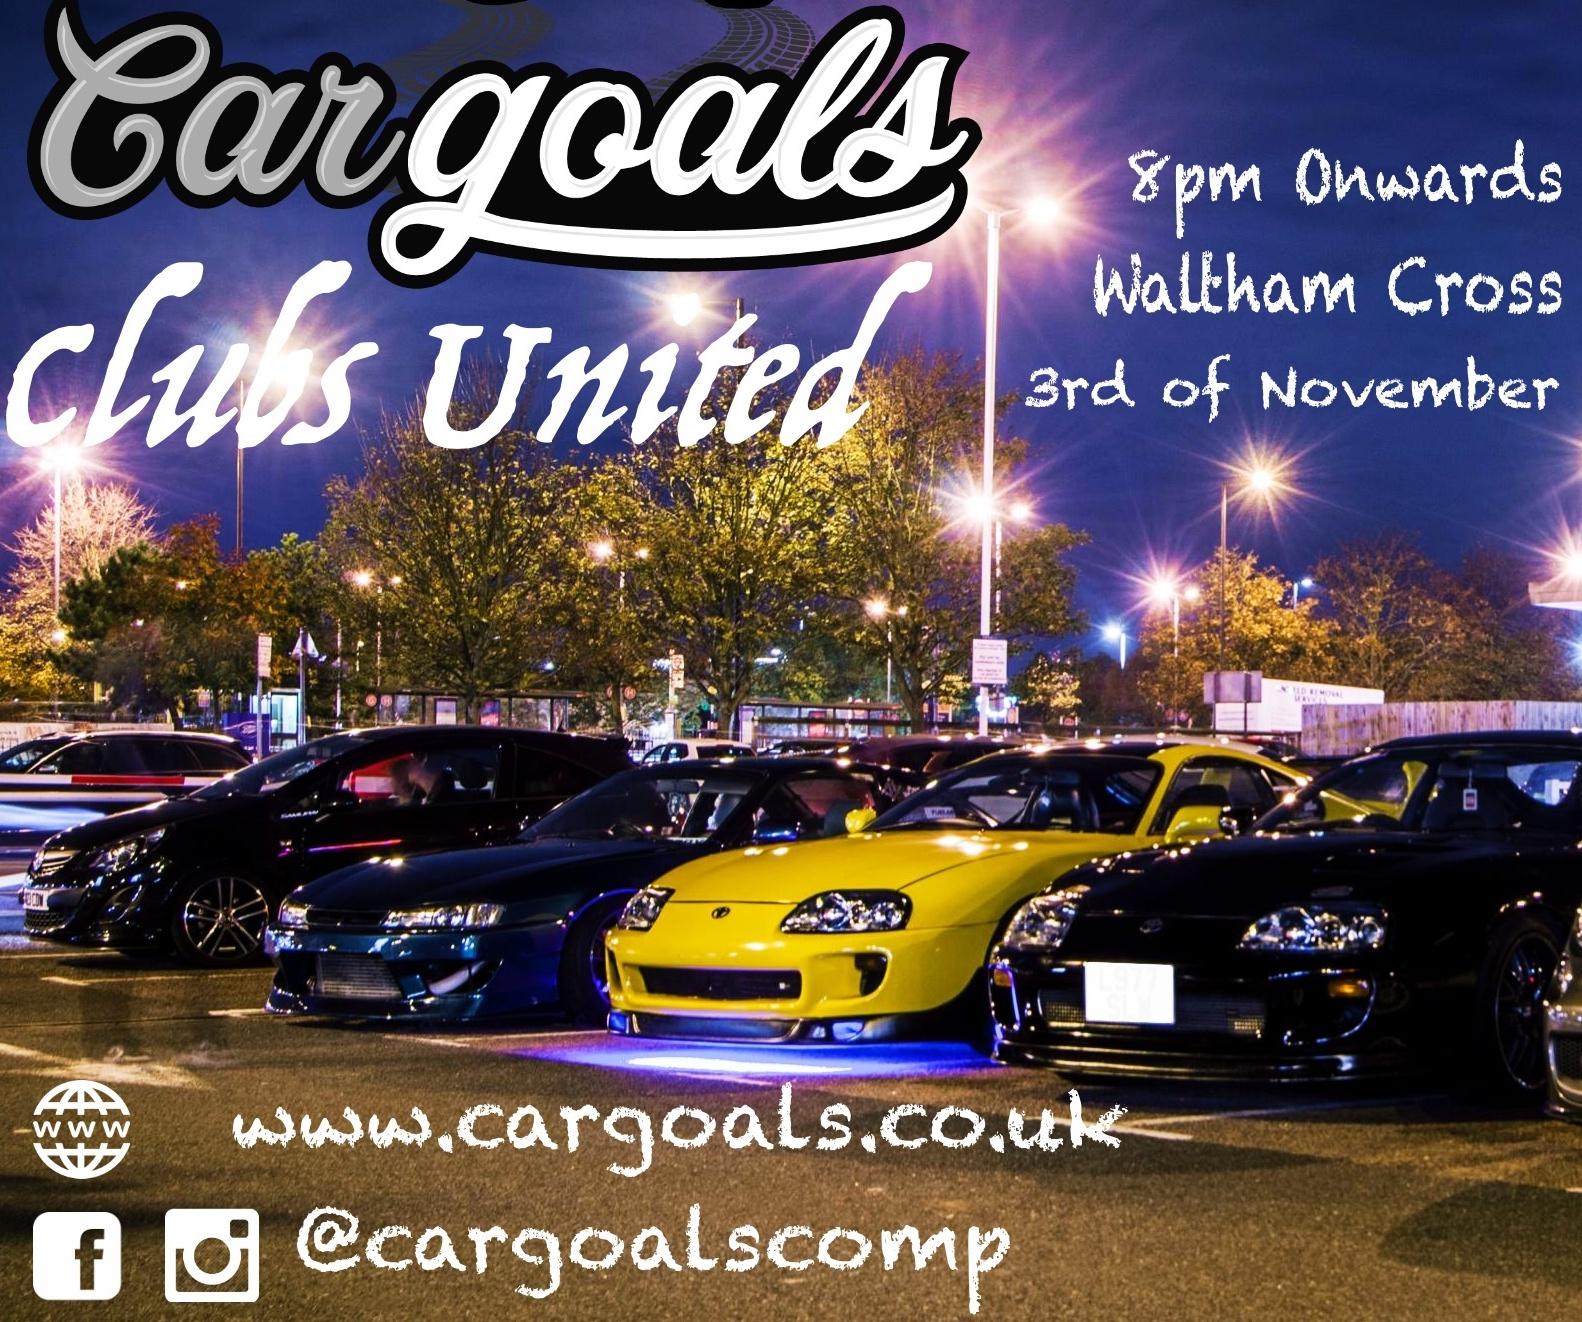 Cargoals Clubs United